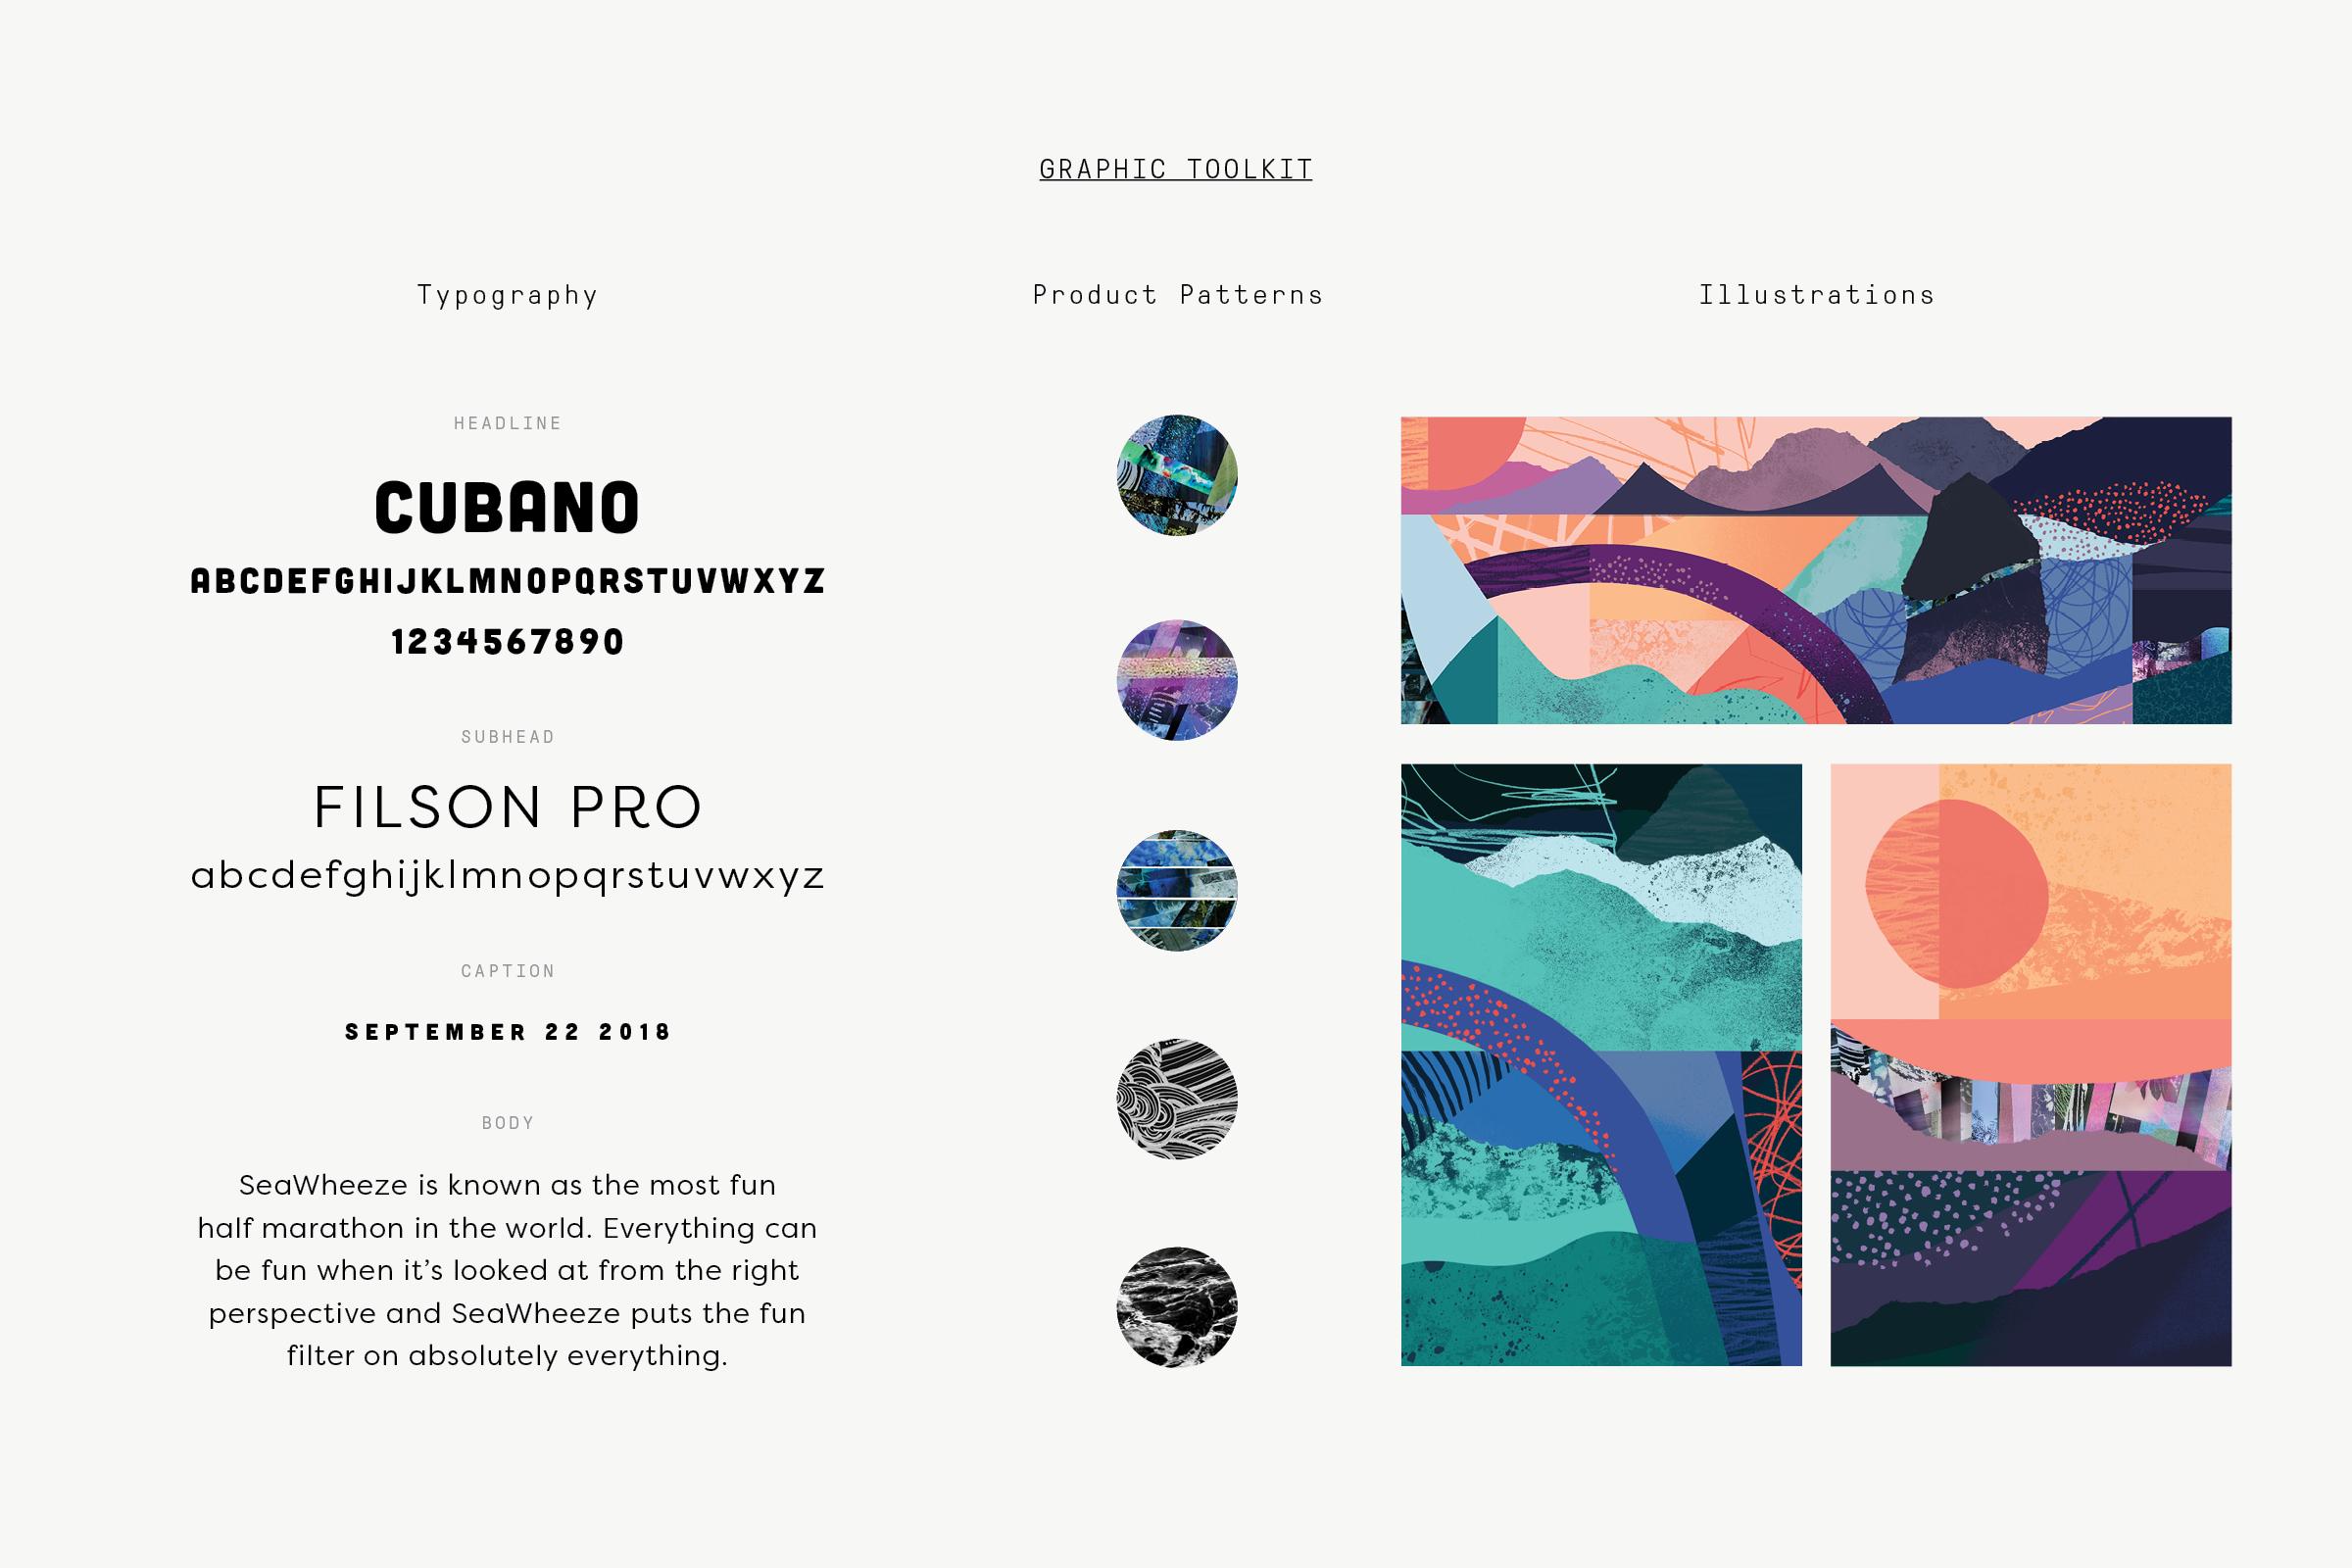 Brand Toolkit for SeaWheeze 2018 Half Marathon by lululemon